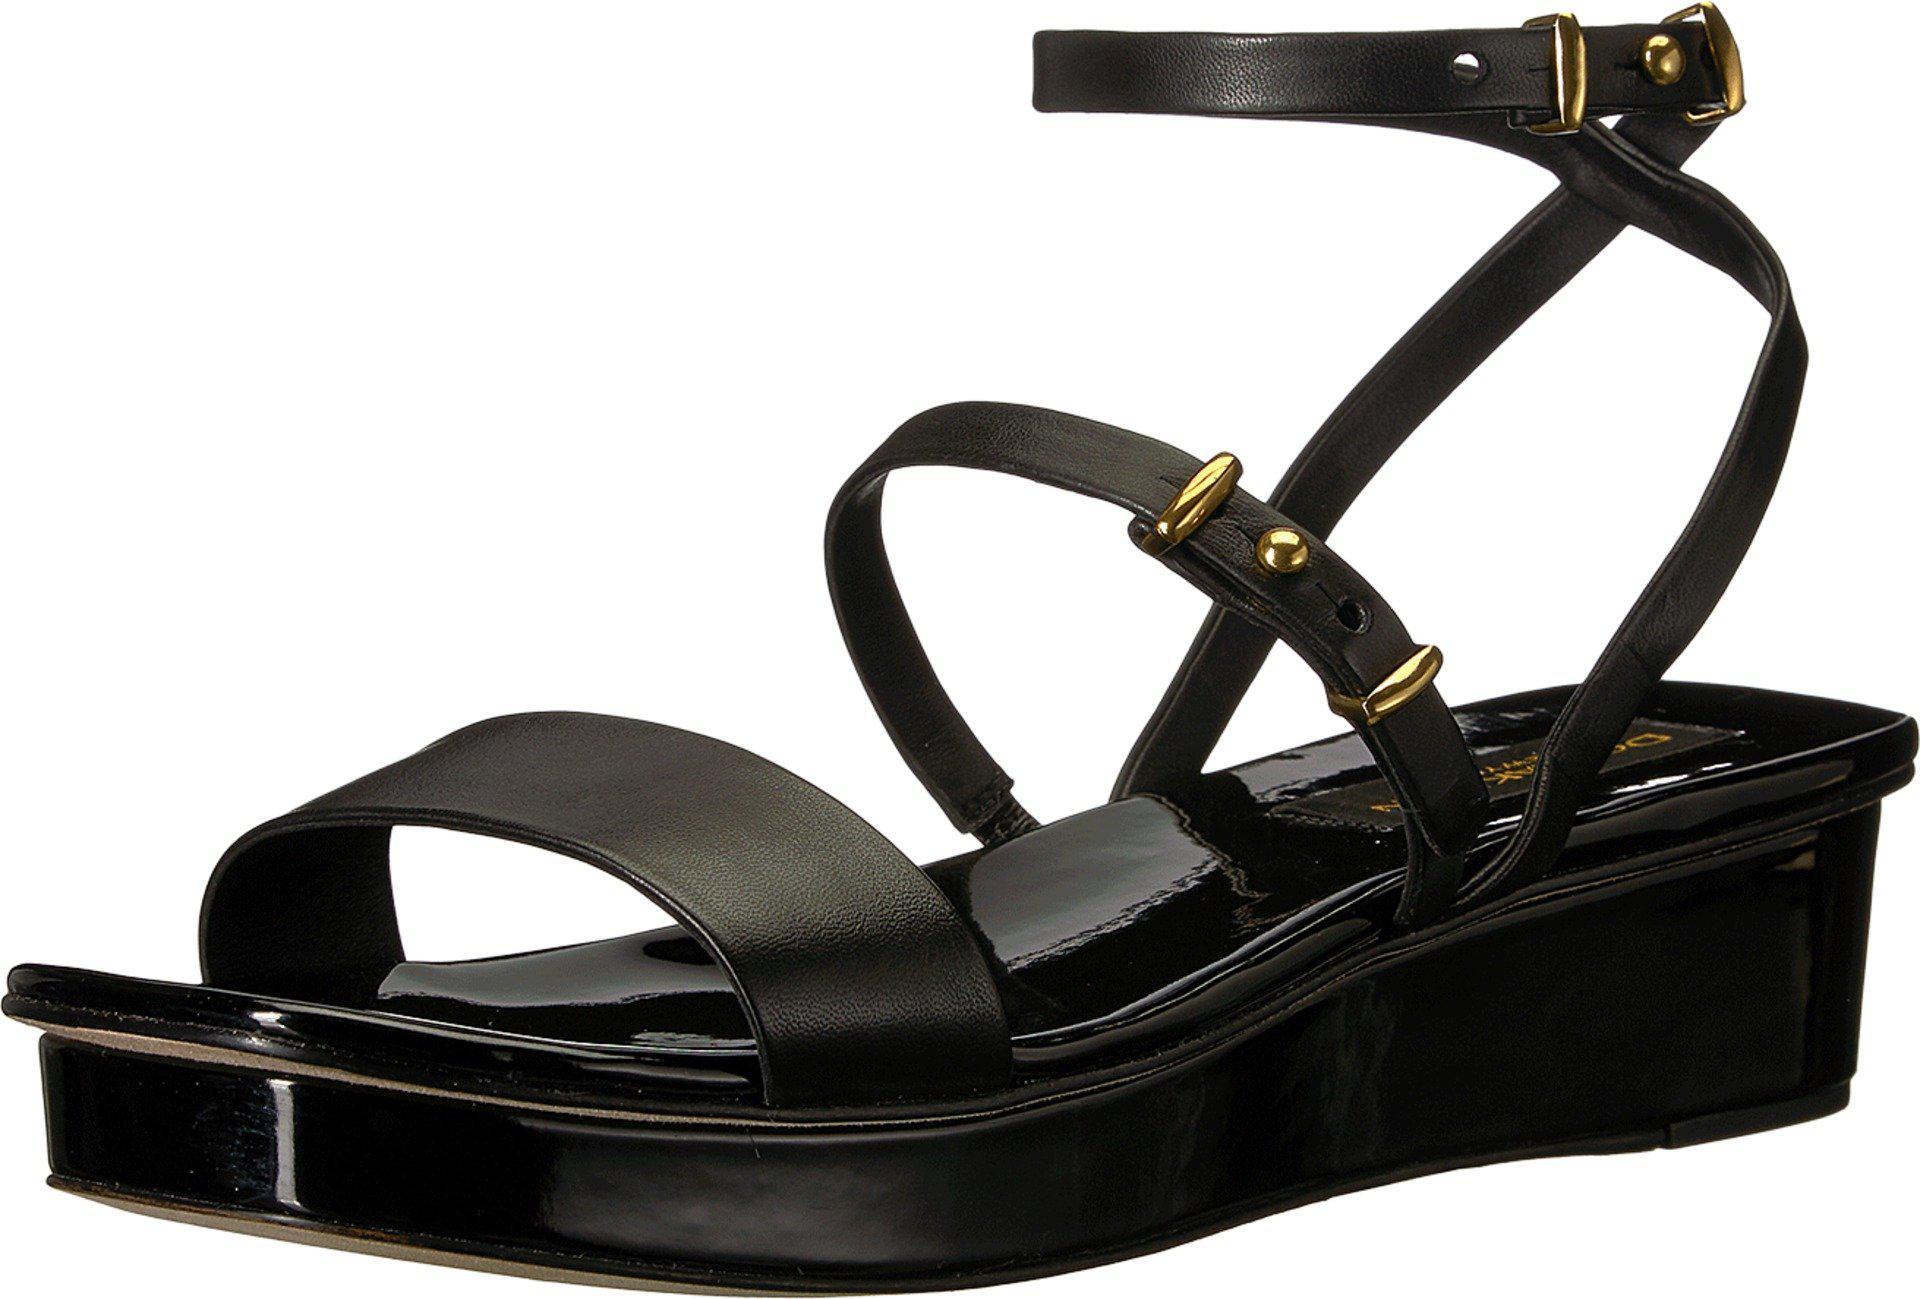 Donna Karan Velda Wedge Sandals gFJ5Lnx